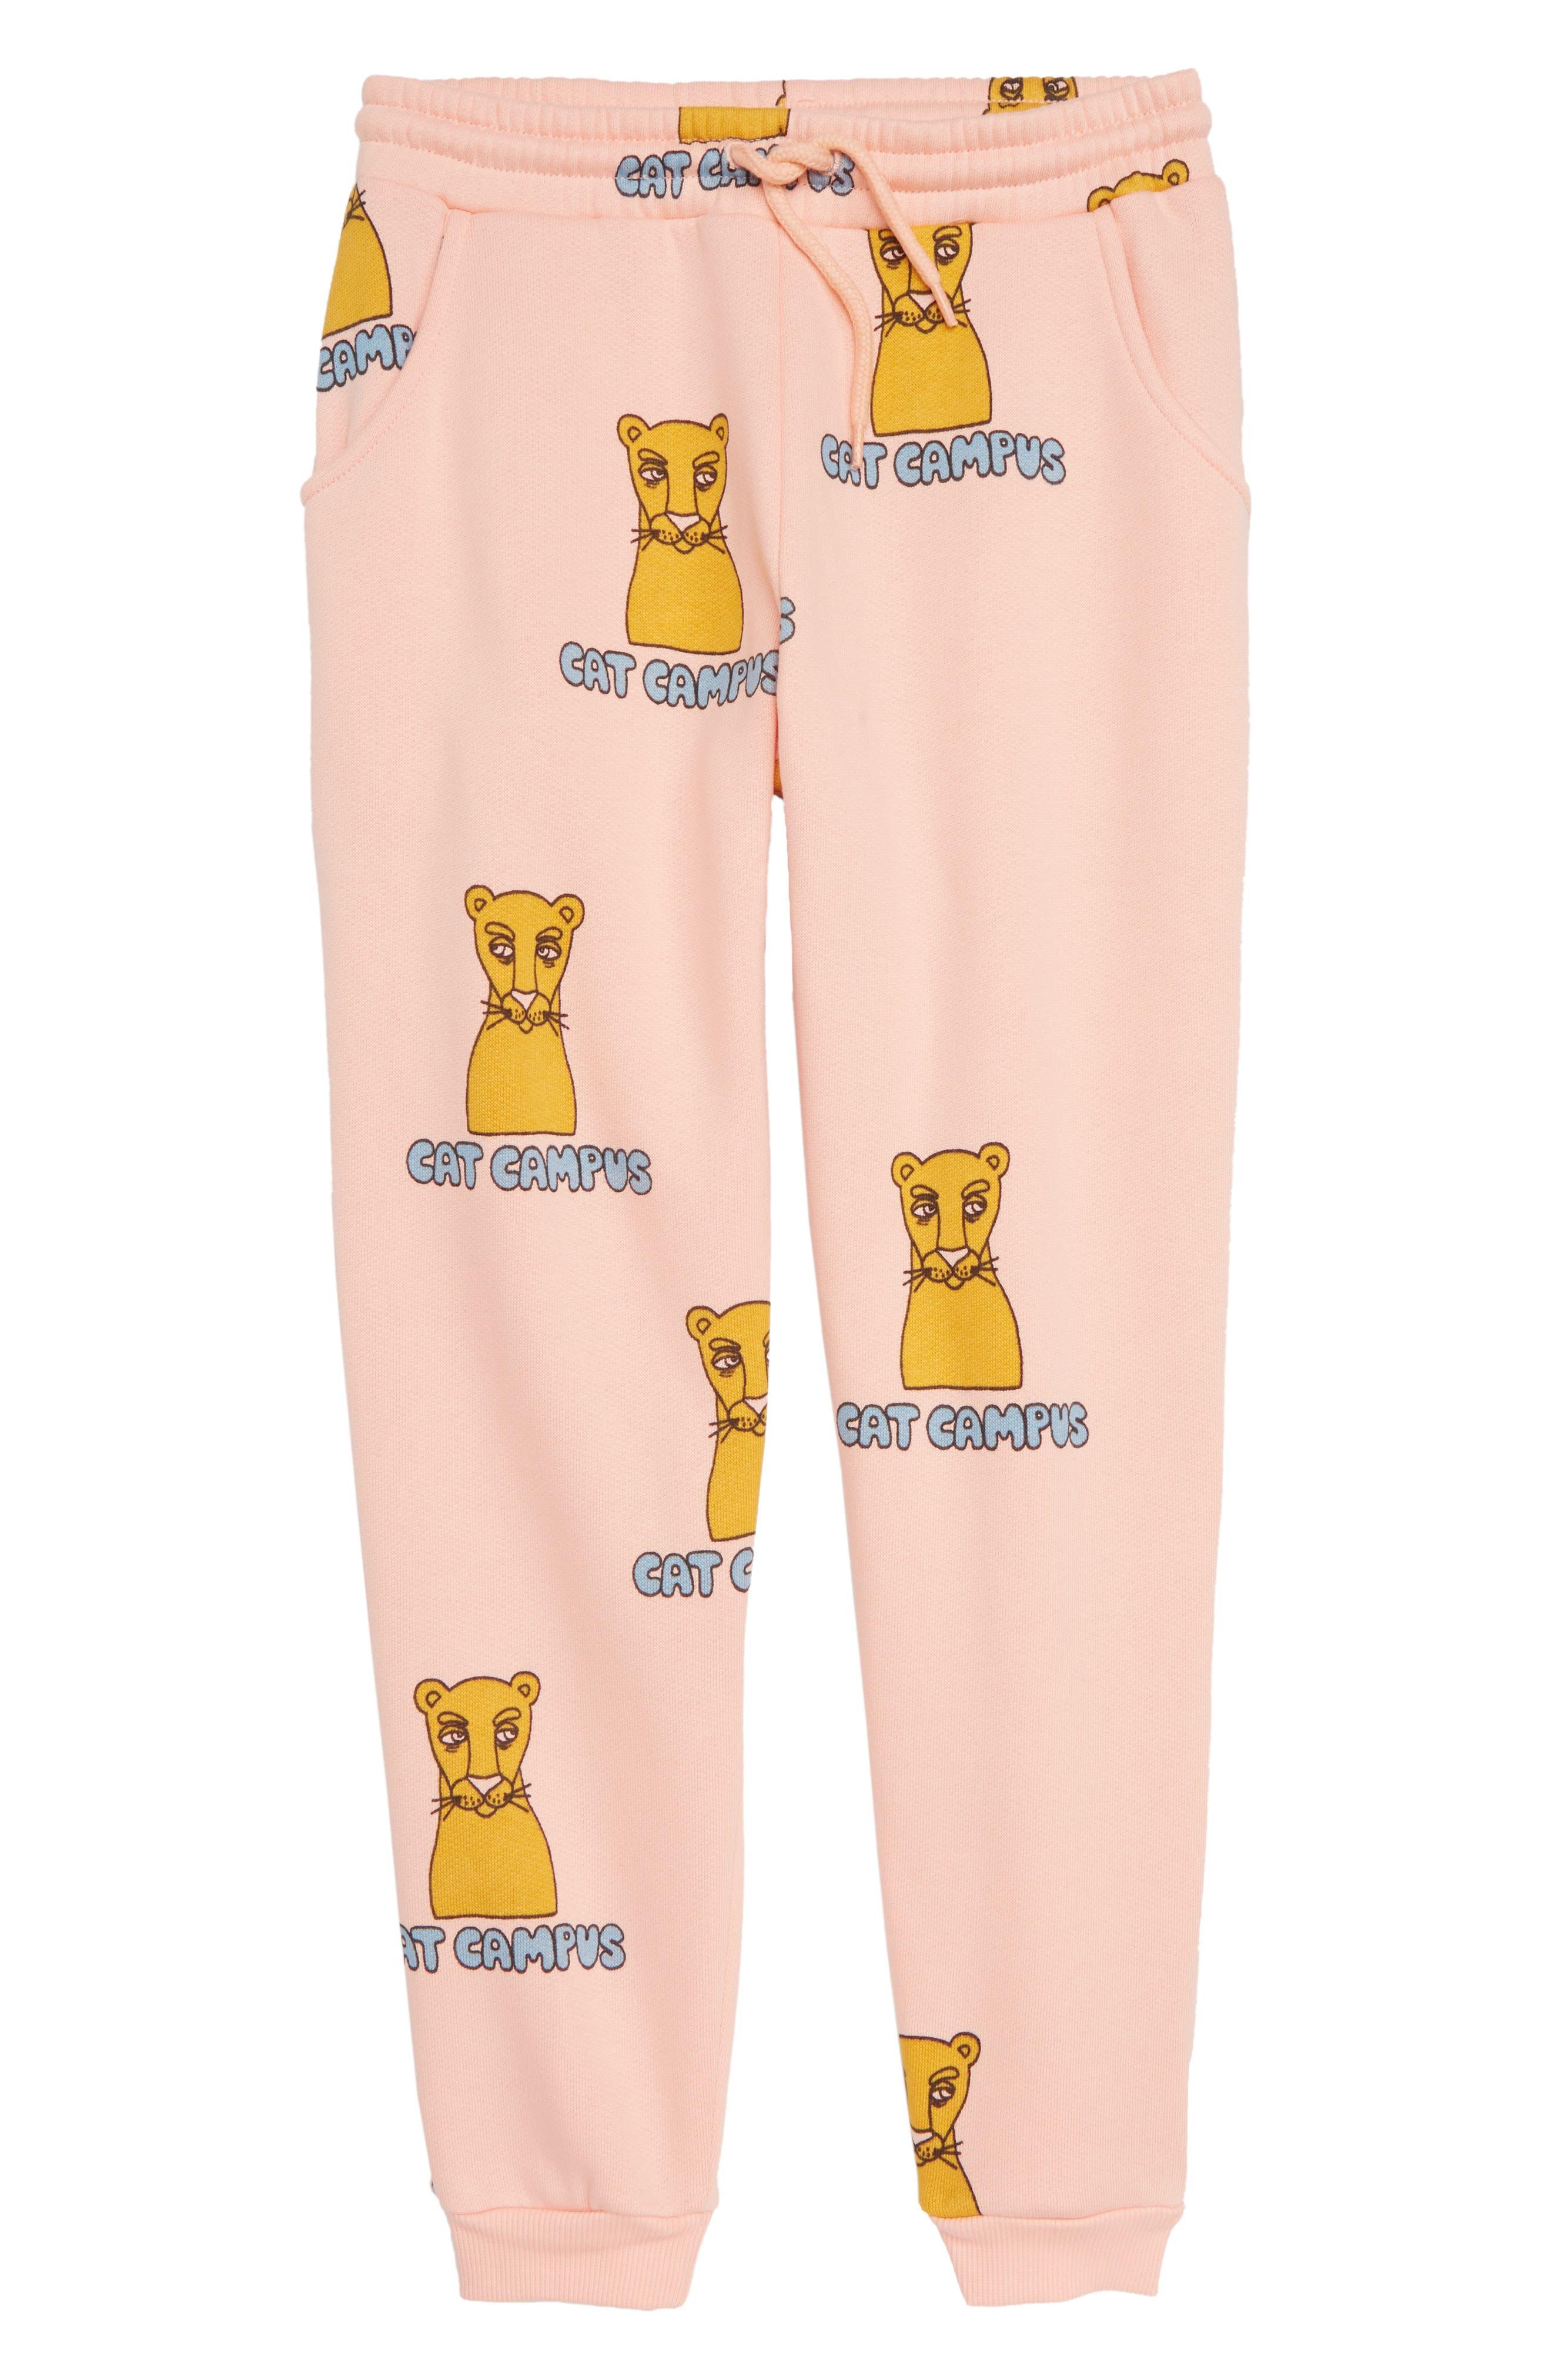 Cat Campus Organic Cotton Sweatpants,                             Main thumbnail 1, color,                             650